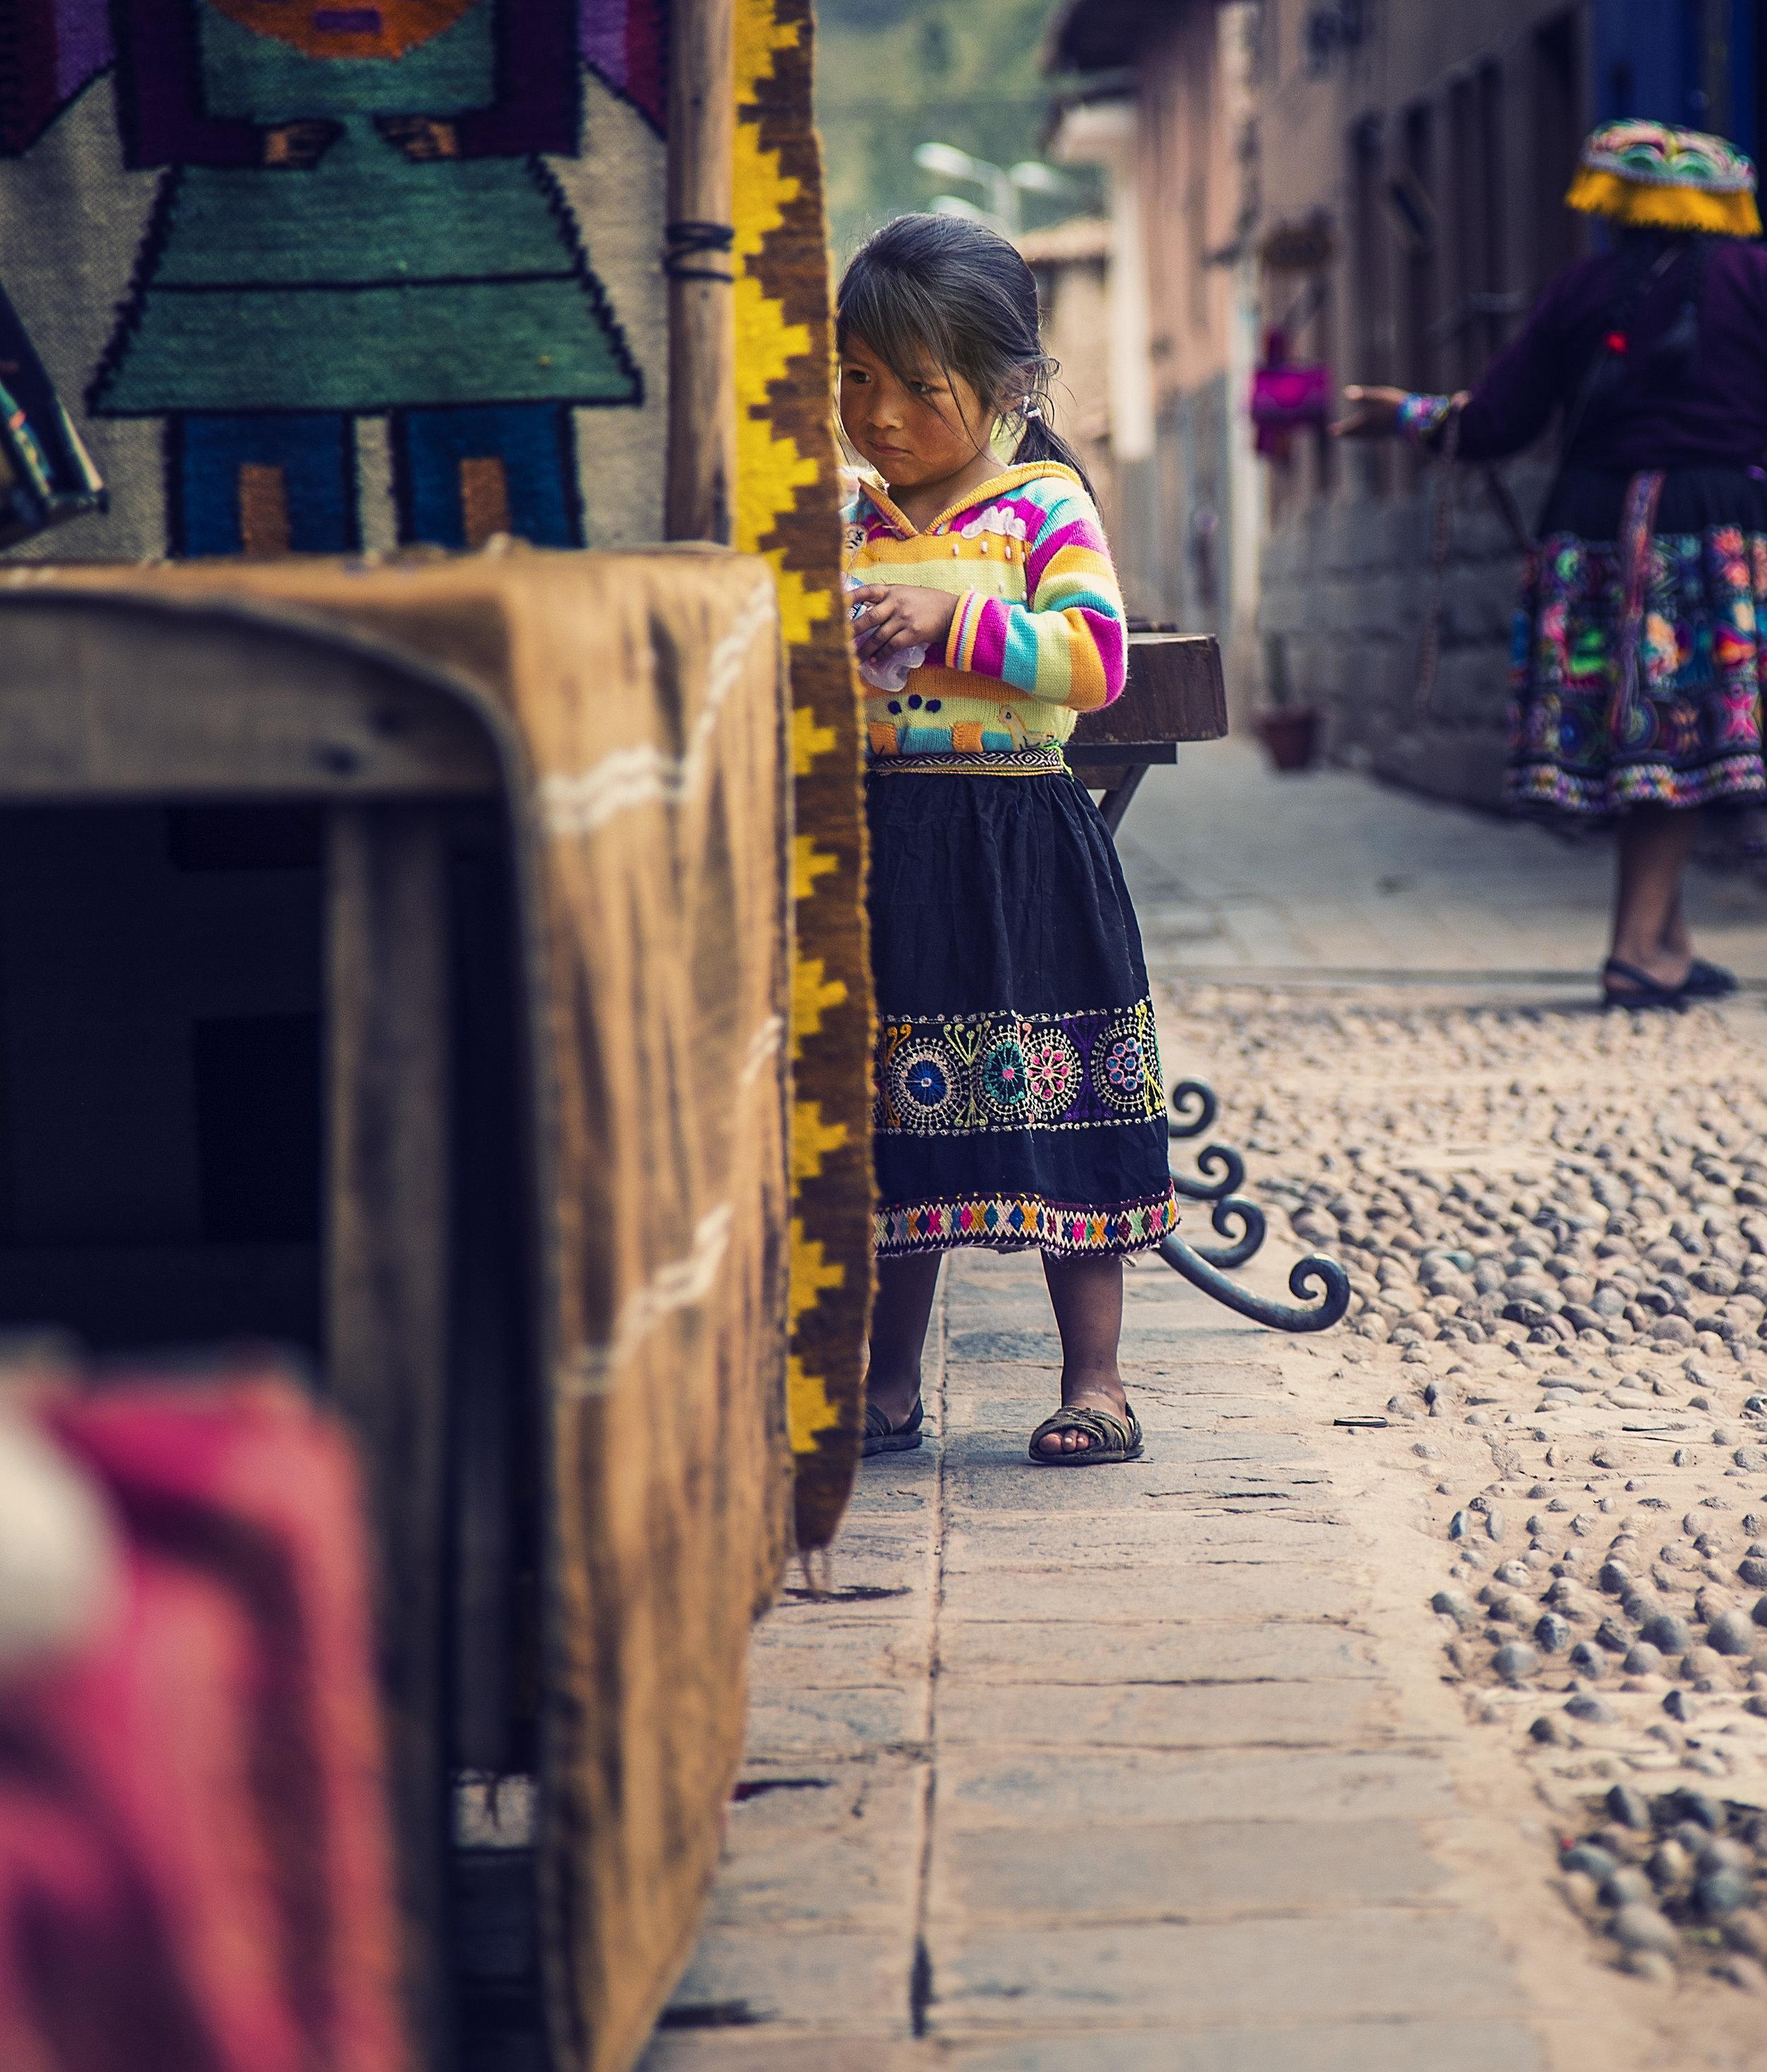 Simon+Needham+Humanitarian+Photography+Peru+4.jpg